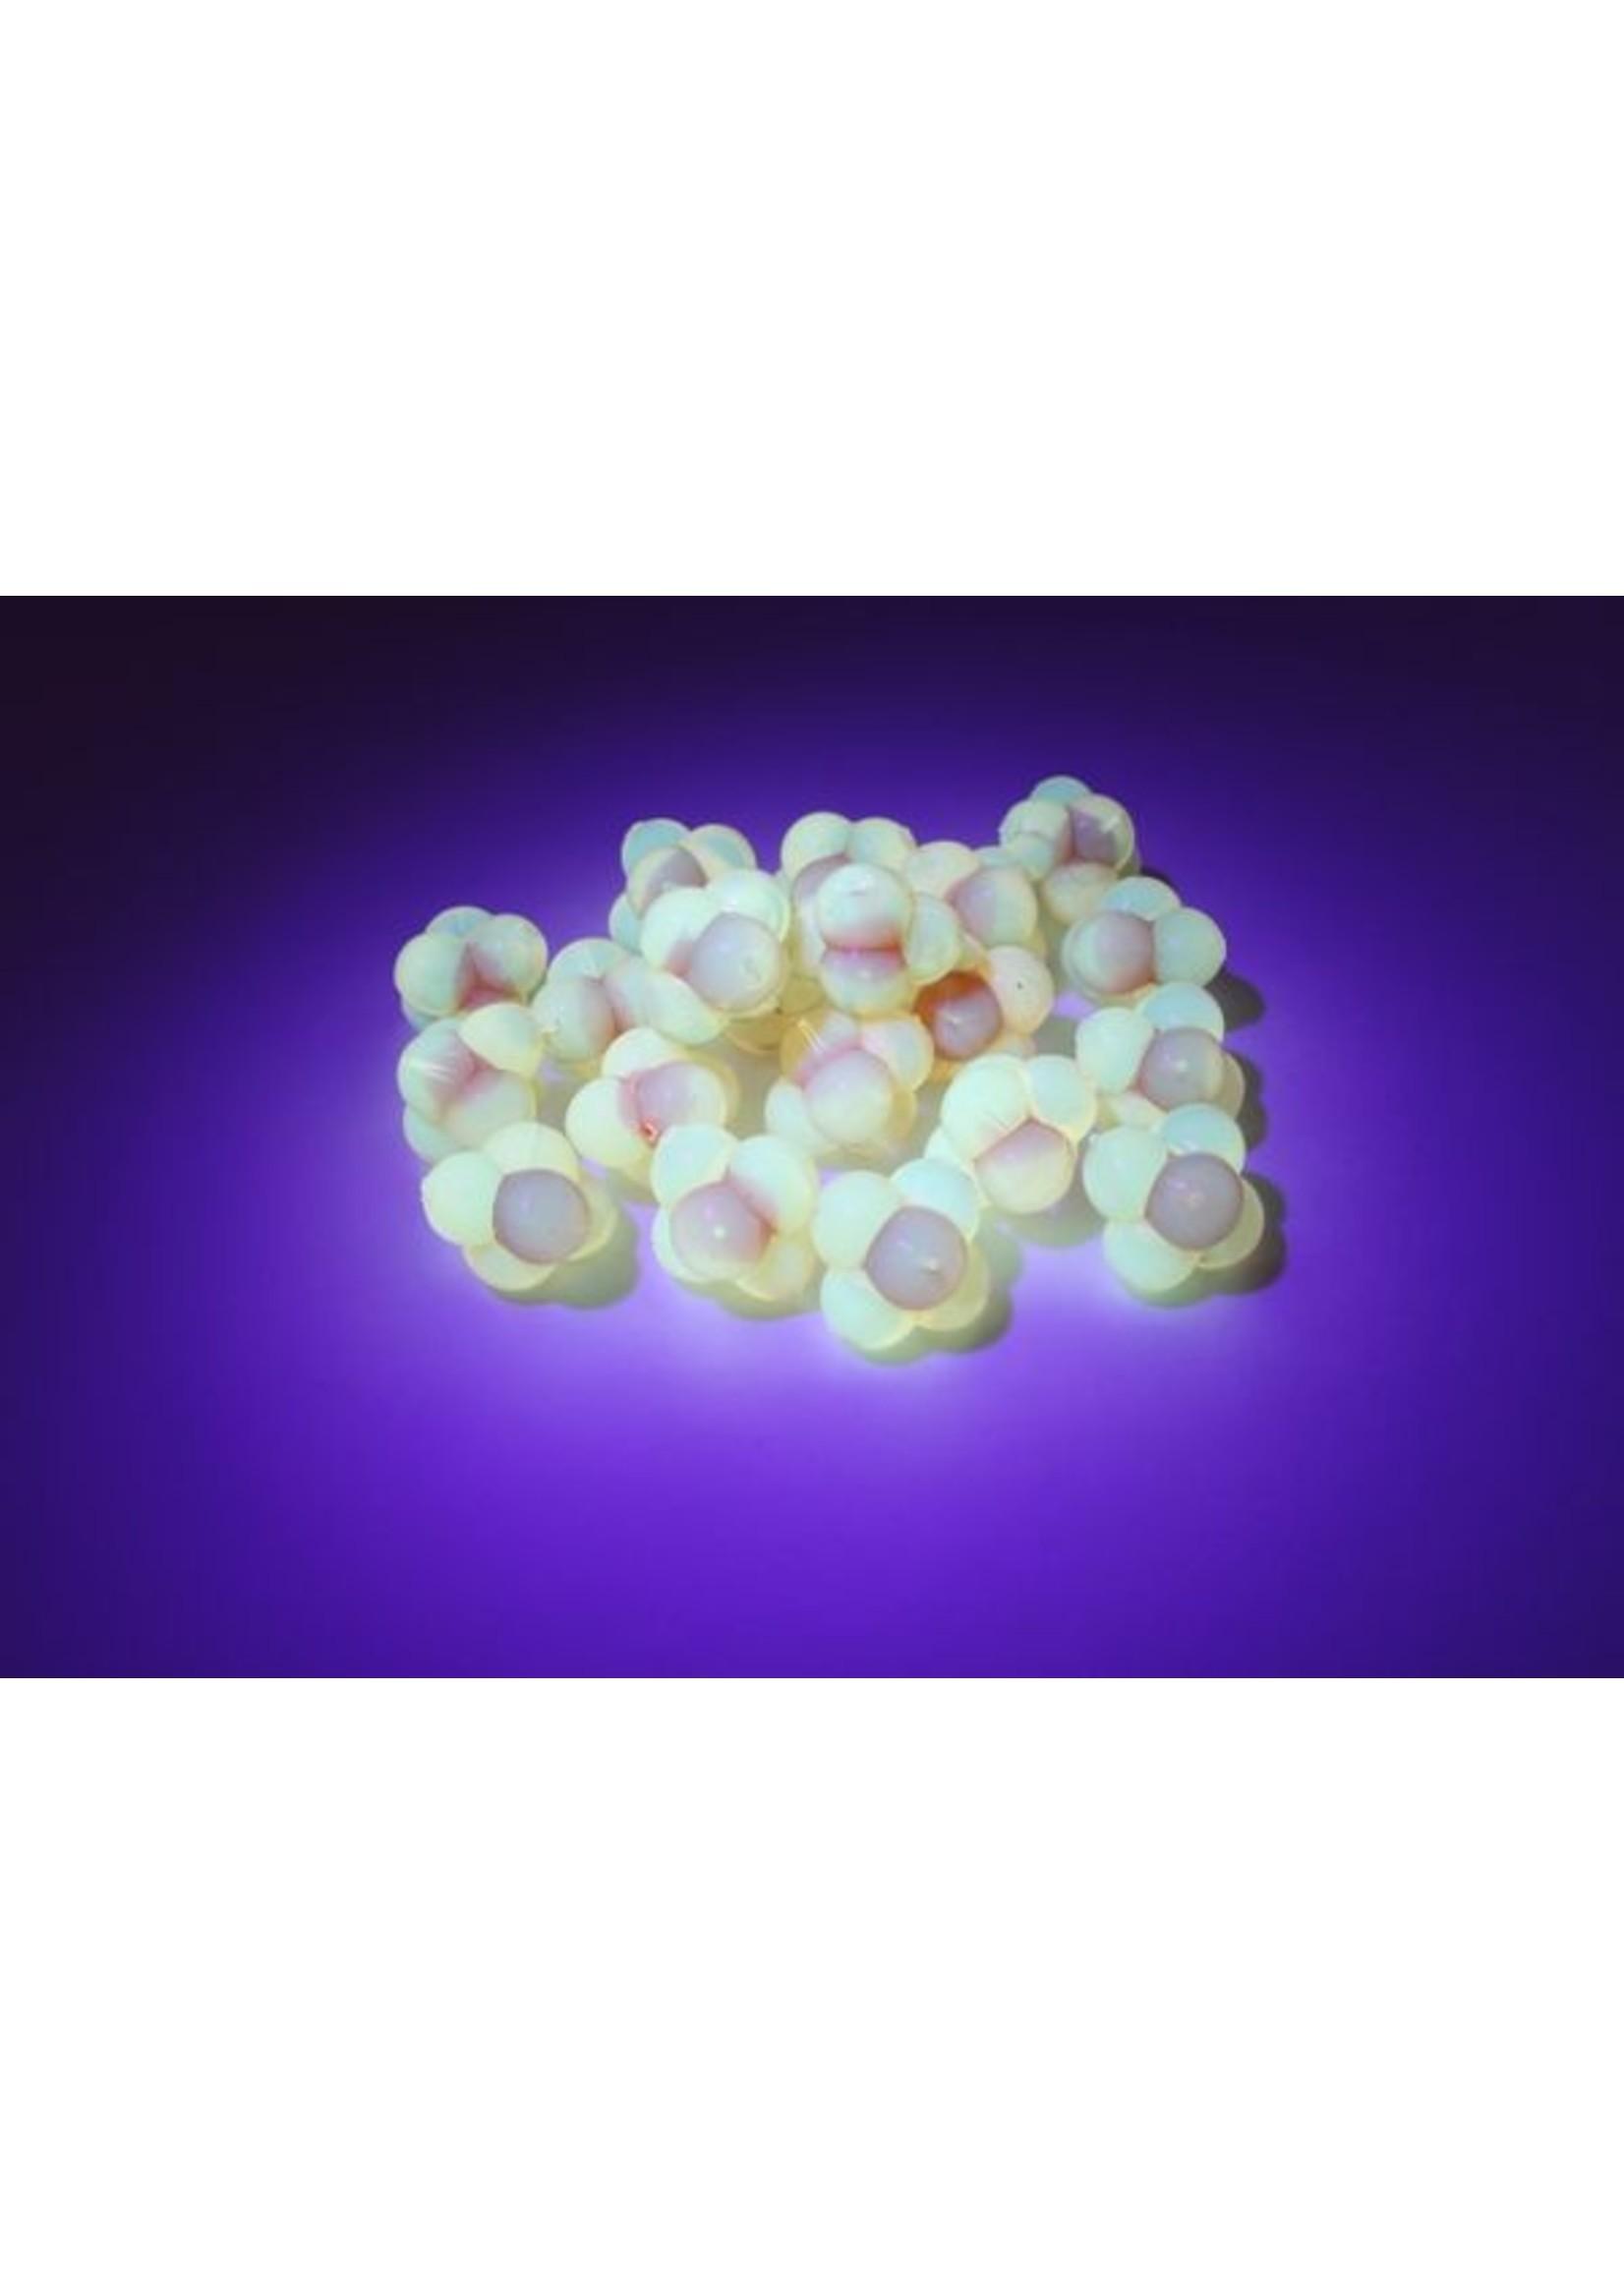 Cleardrift Cleardrift Embryo Egg Clusters Lg Nat Org w/Red Embryo